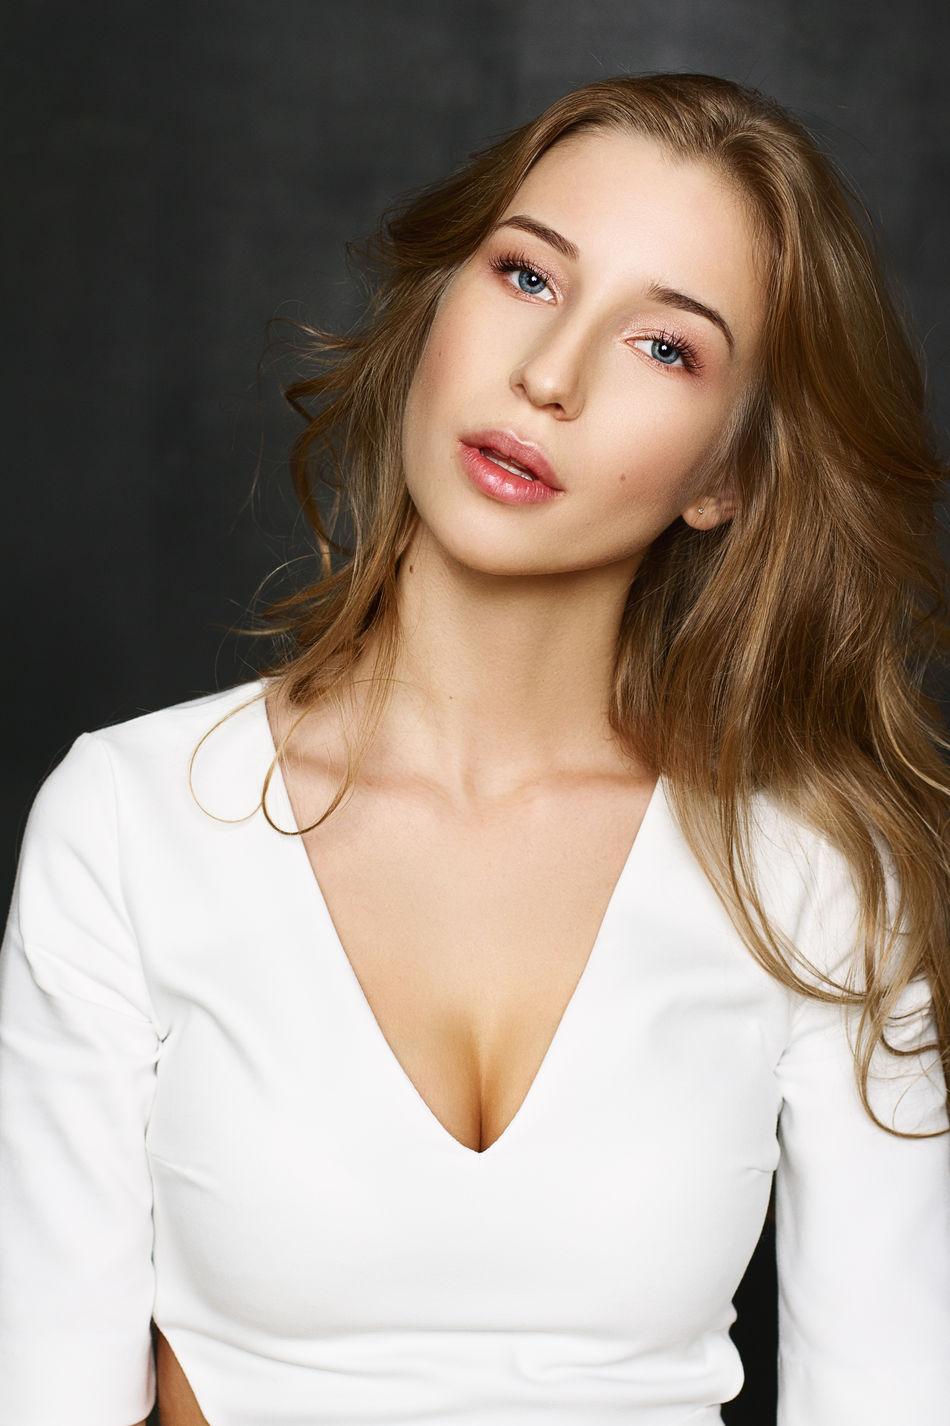 Beautiful stock photos of lippen, beauty, portrait, one woman only, beautiful woman